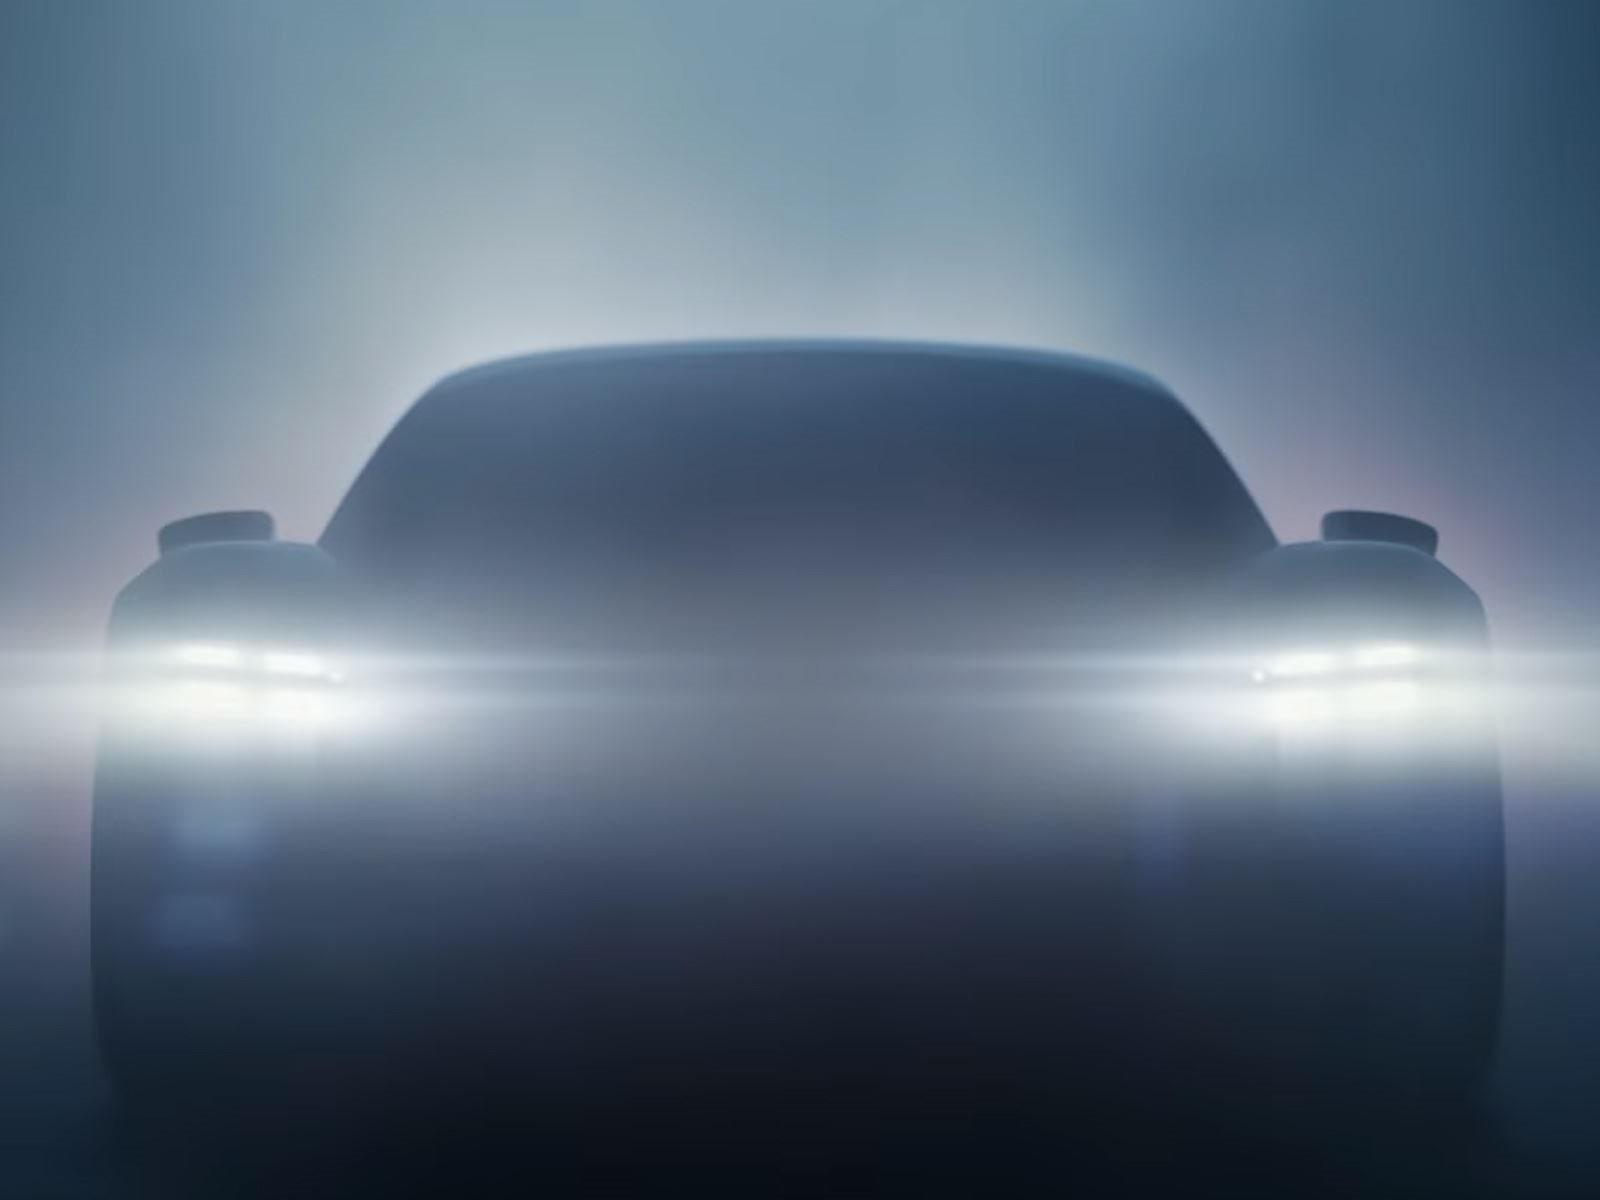 Porsche Taycan: Έρχεται το 2020 με αυτονομία 480 χιλιόμετρα, ισχύ 600 ίππους και ταχυφόρτιση